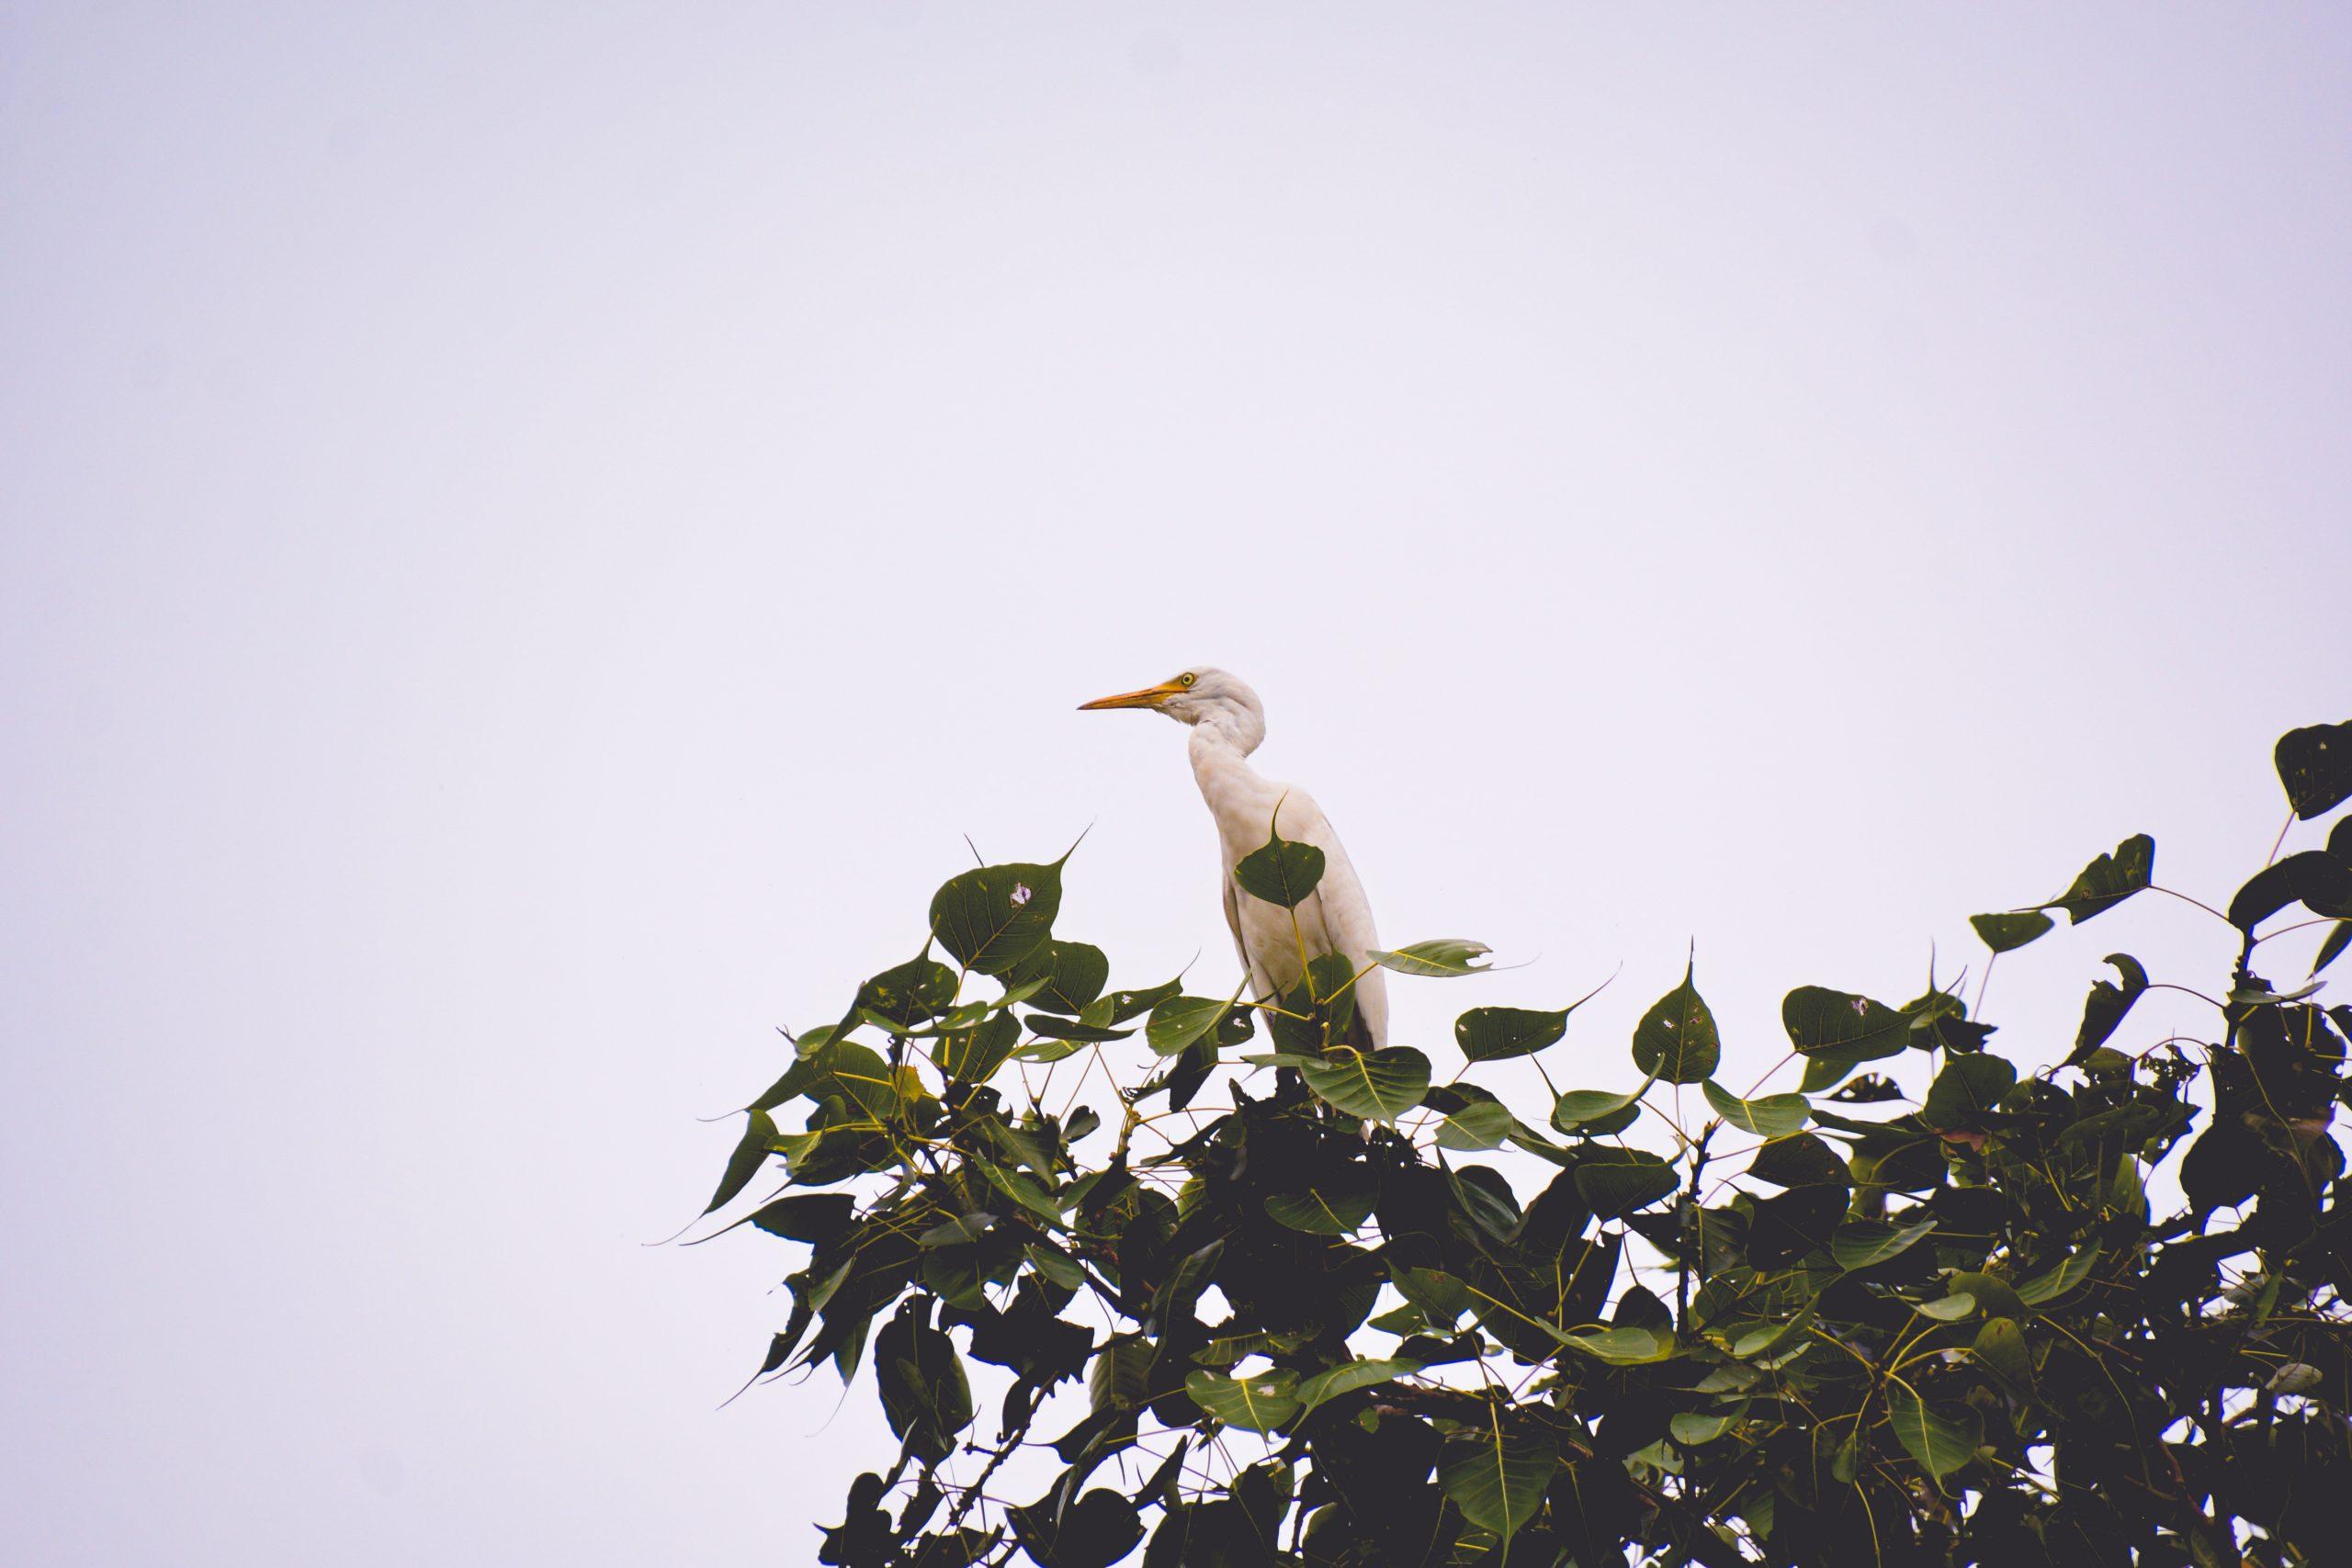 A crane bird on a tree top